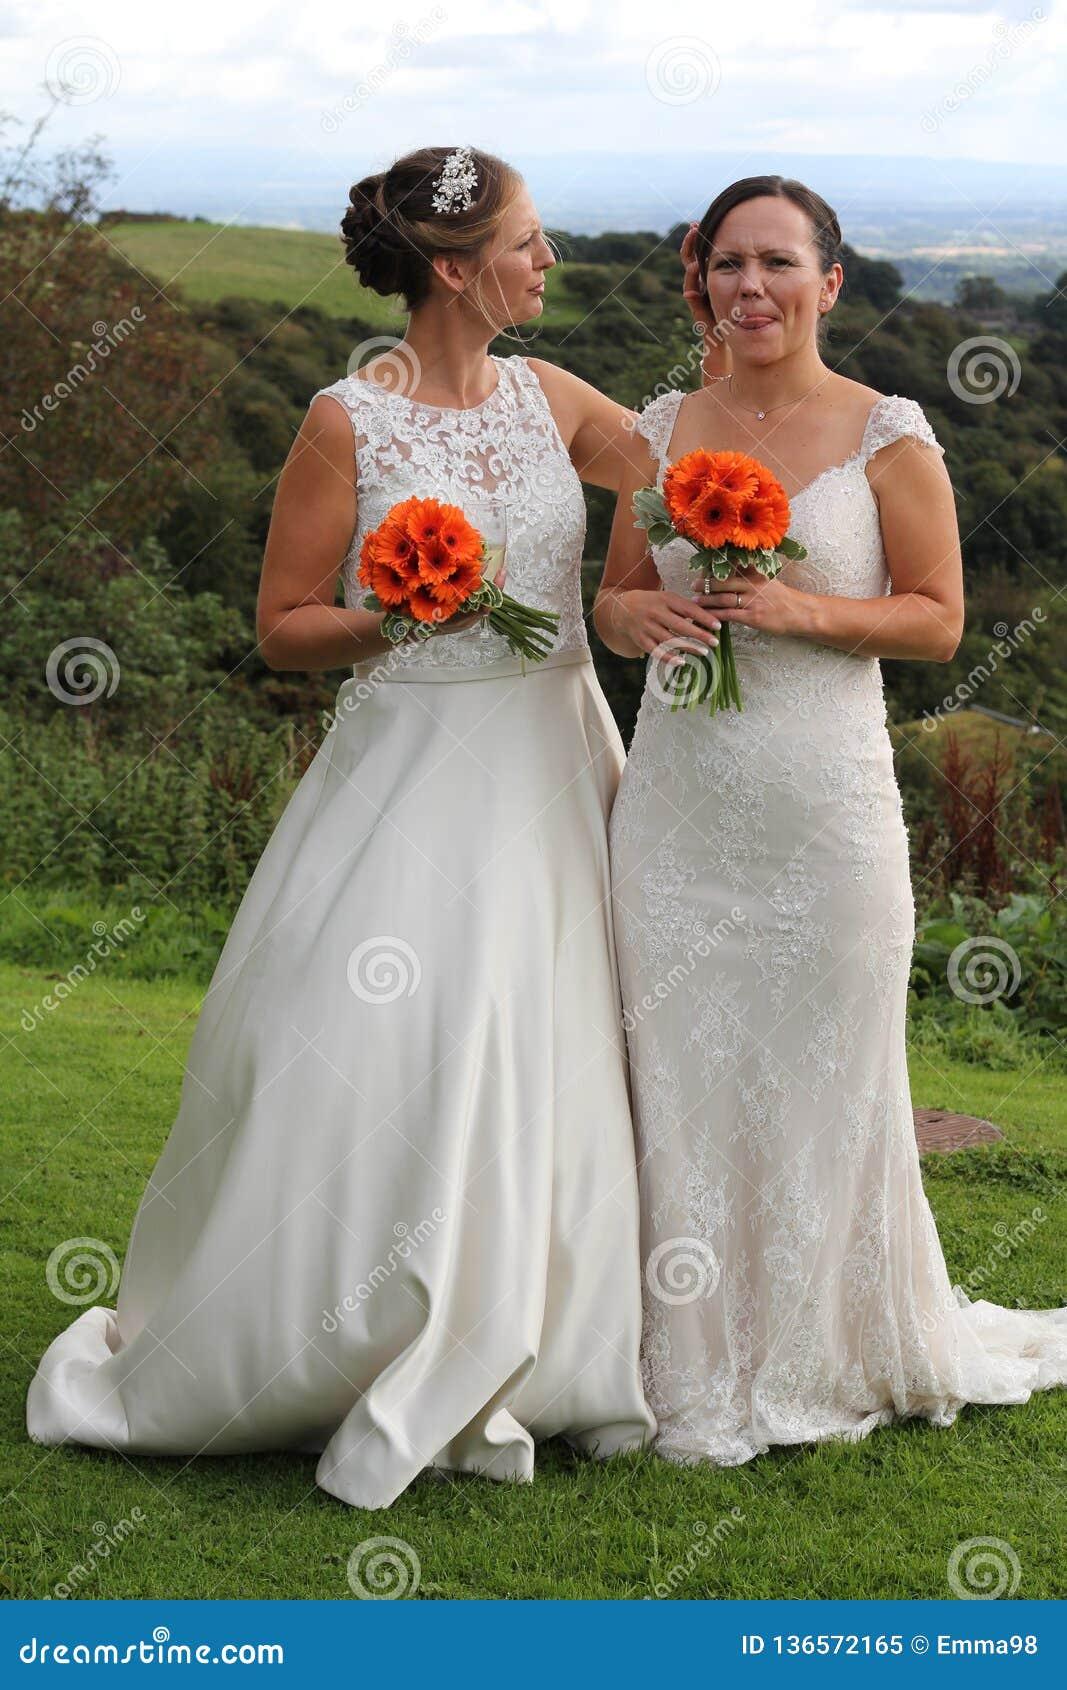 Same sex rural wedding